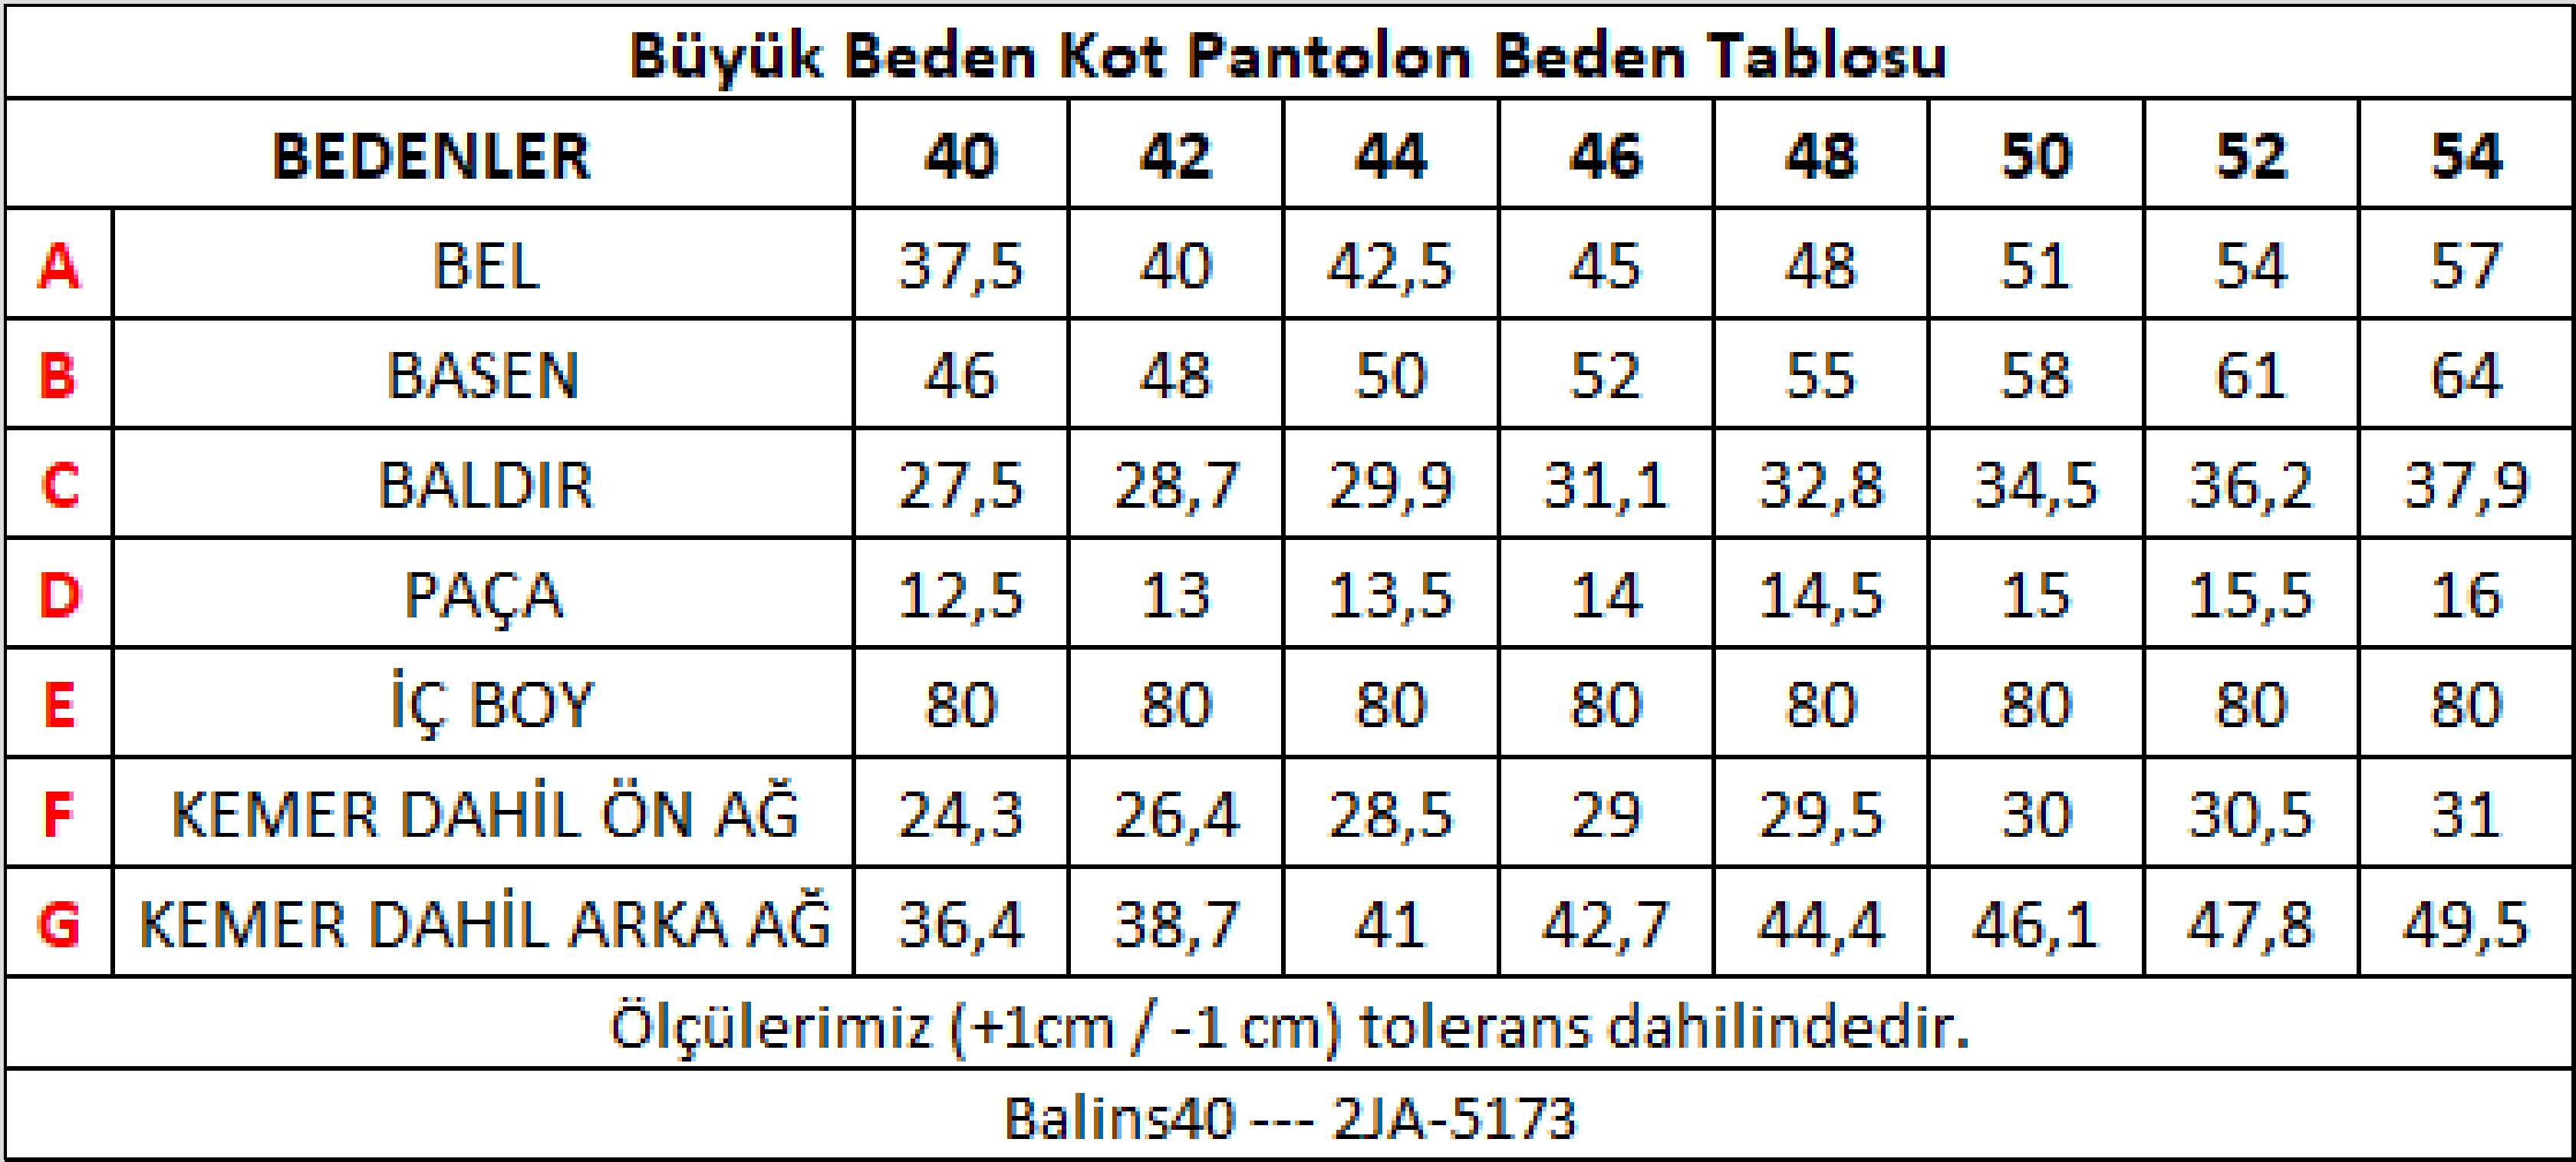 balins-40.png (49 KB)